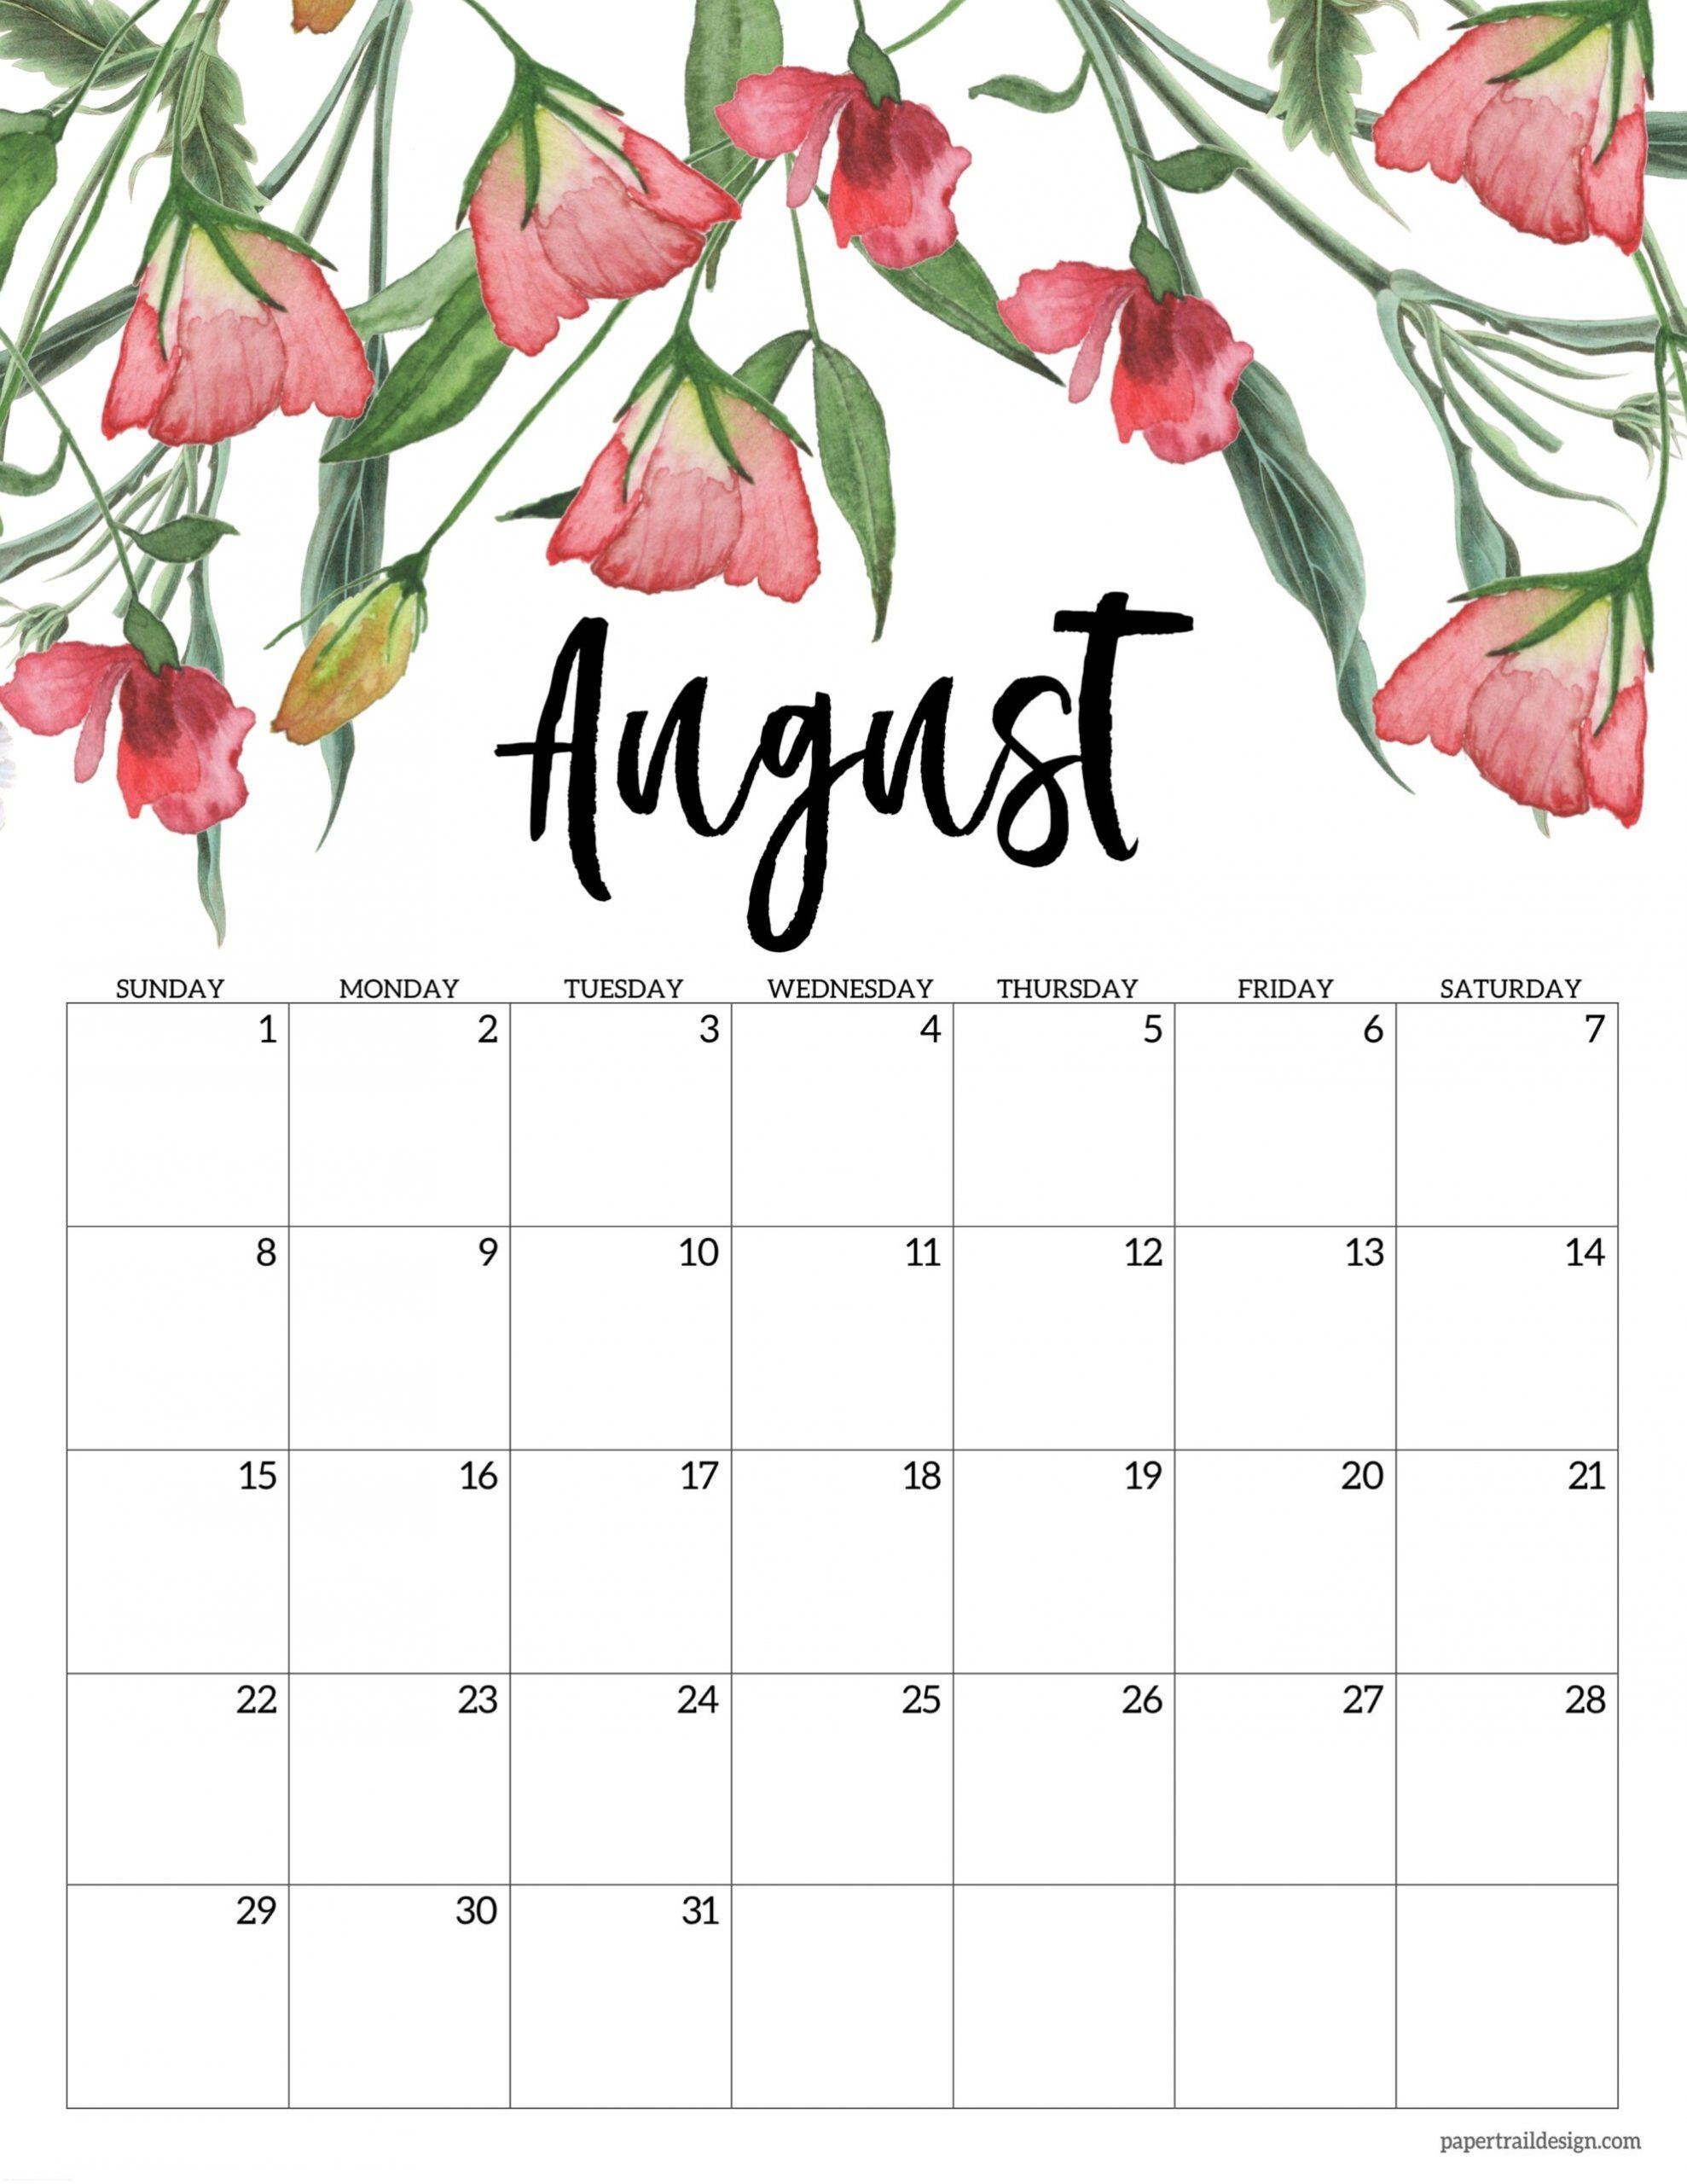 Free Printable 2021 Floral Calendar | Paper Trail Design  Calendar 2021 August To December